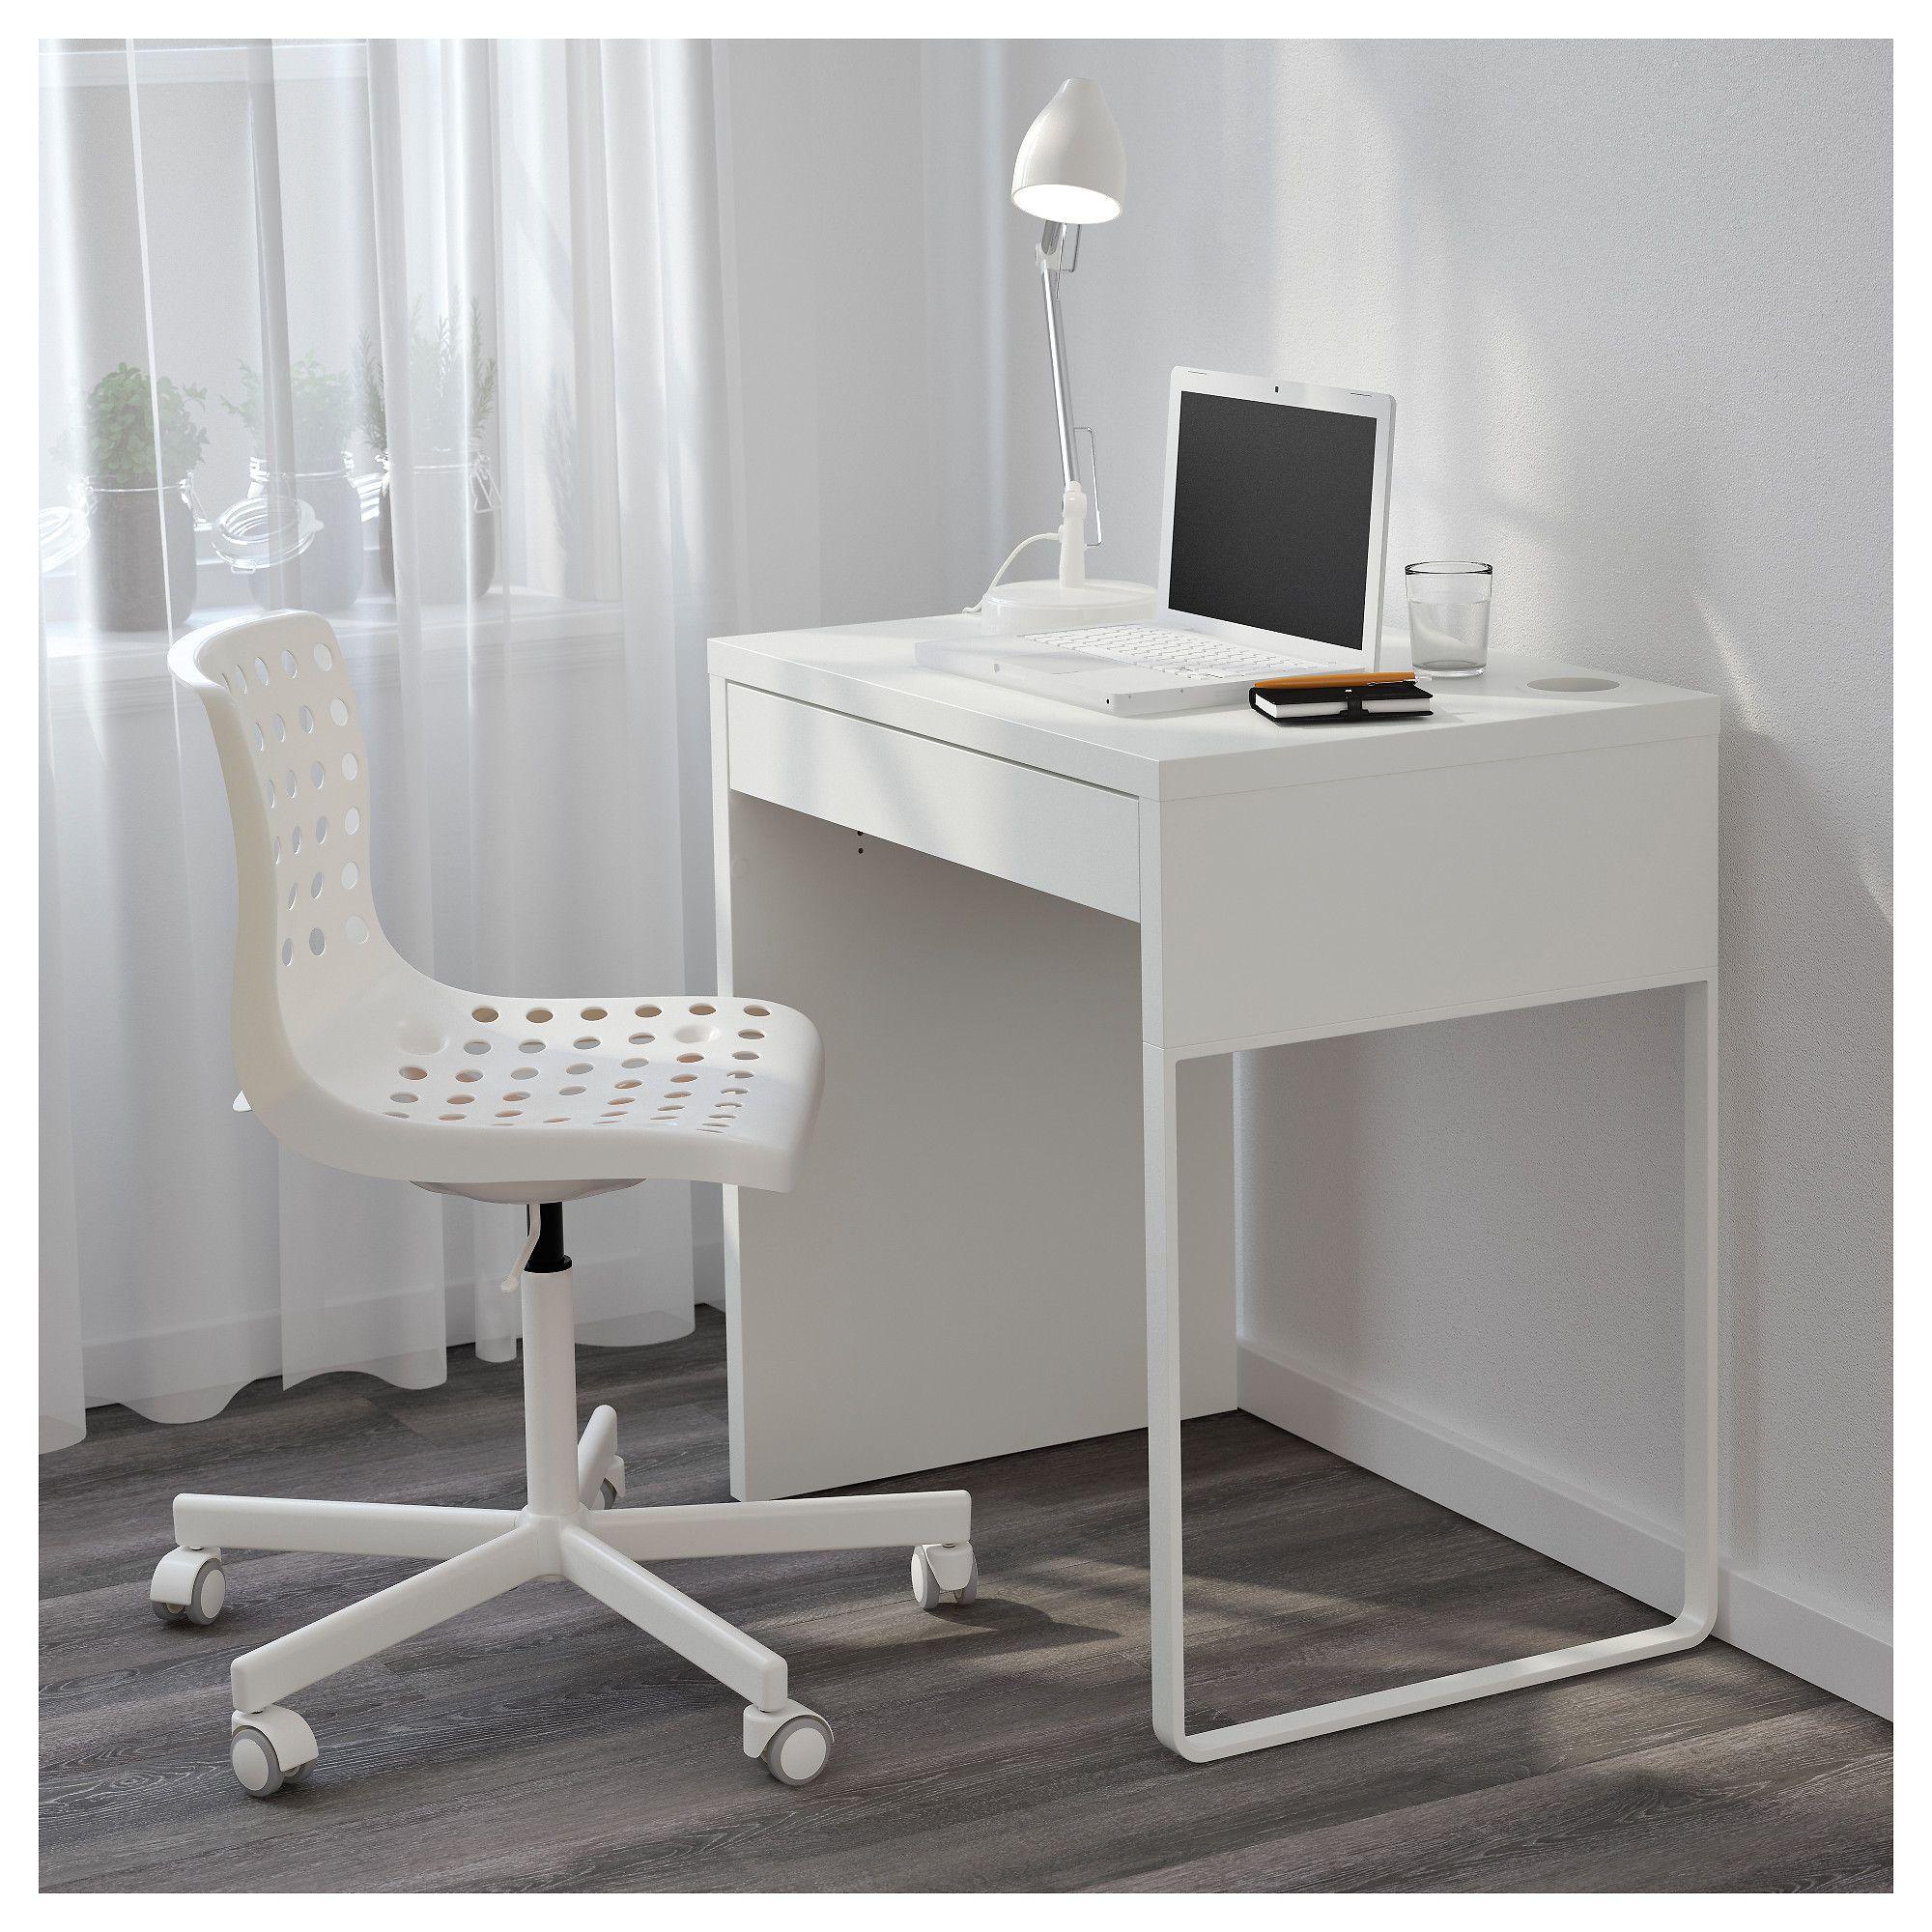 Micke White Desk 73x50 Cm Ikea Desks For Small Spaces Micke Desk Best Home Office Desk